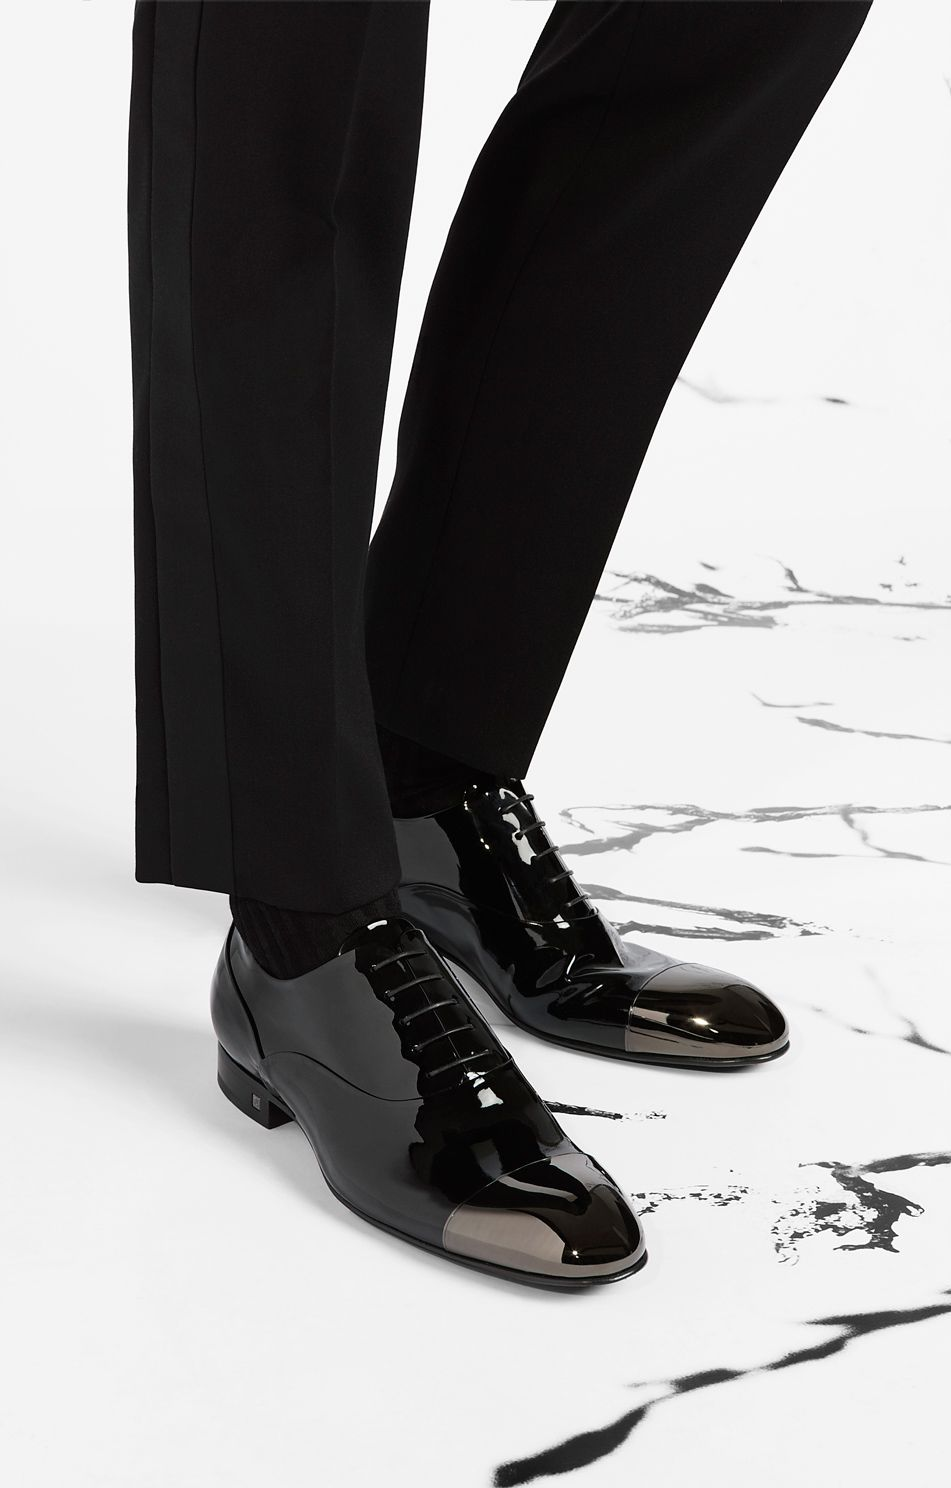 Louis vuitton autumnwinter 20132014 shoe collection all